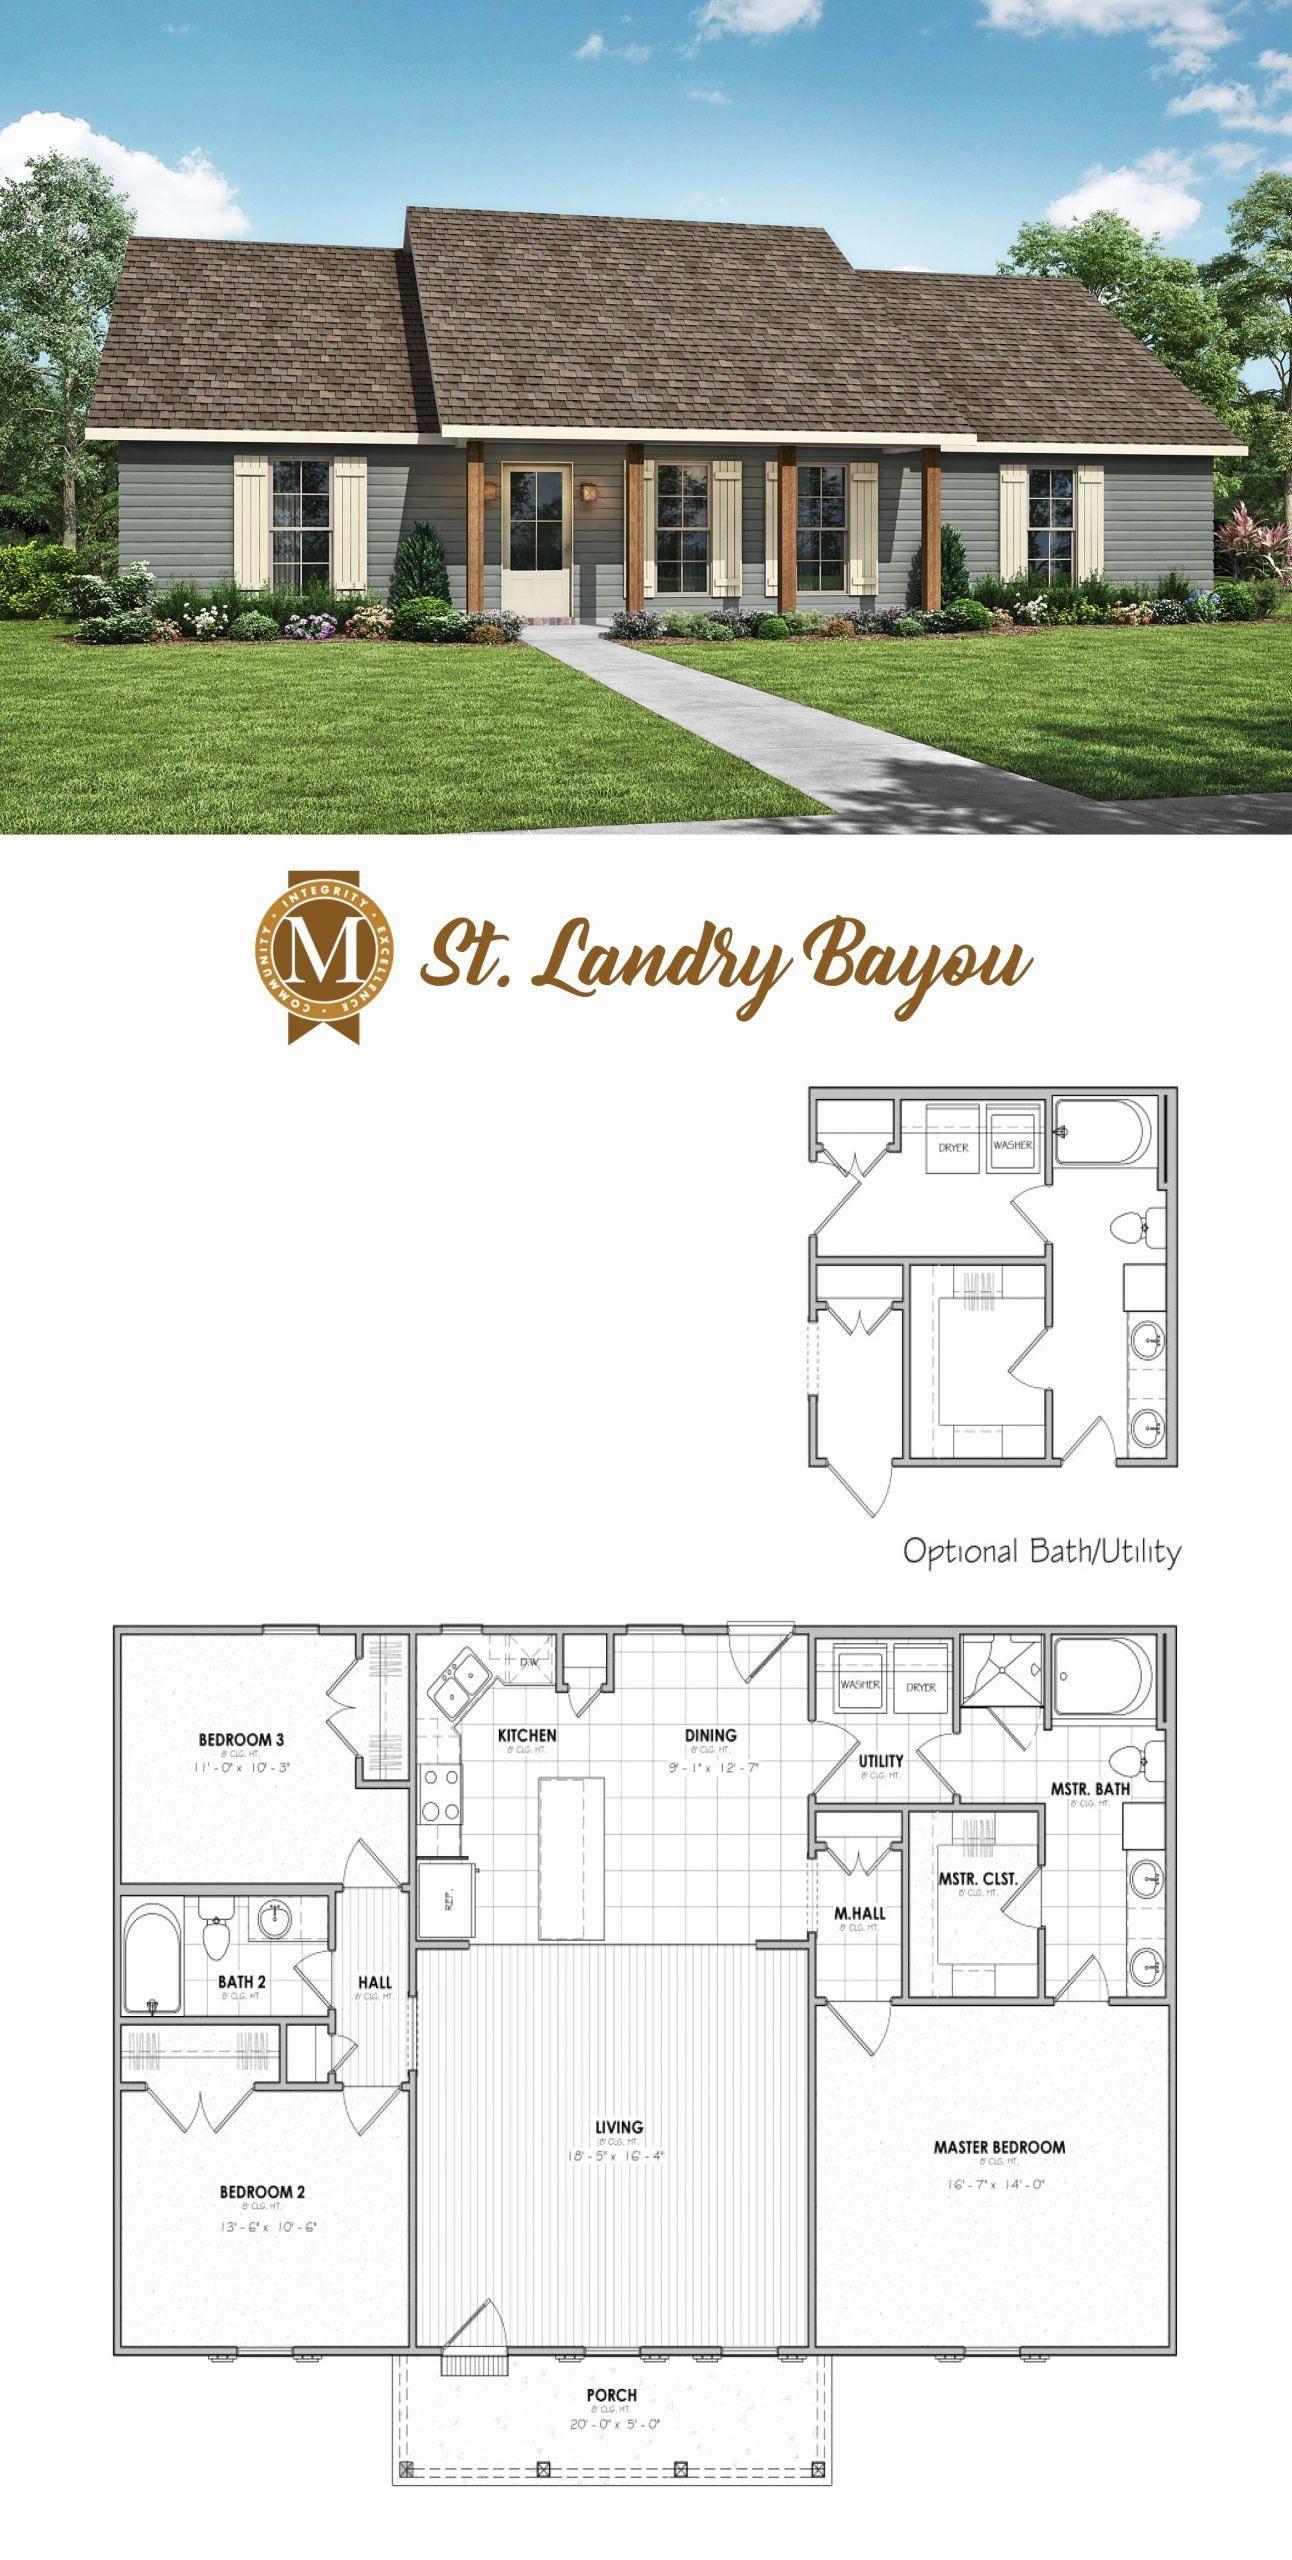 Louisiana Cottage House Plans Beautiful Living Sq Ft 1 500 Bedrooms 3 Baths 2 Lafayette Lake Evegra House Plans Farmhouse Small House Plans Dream House Plans